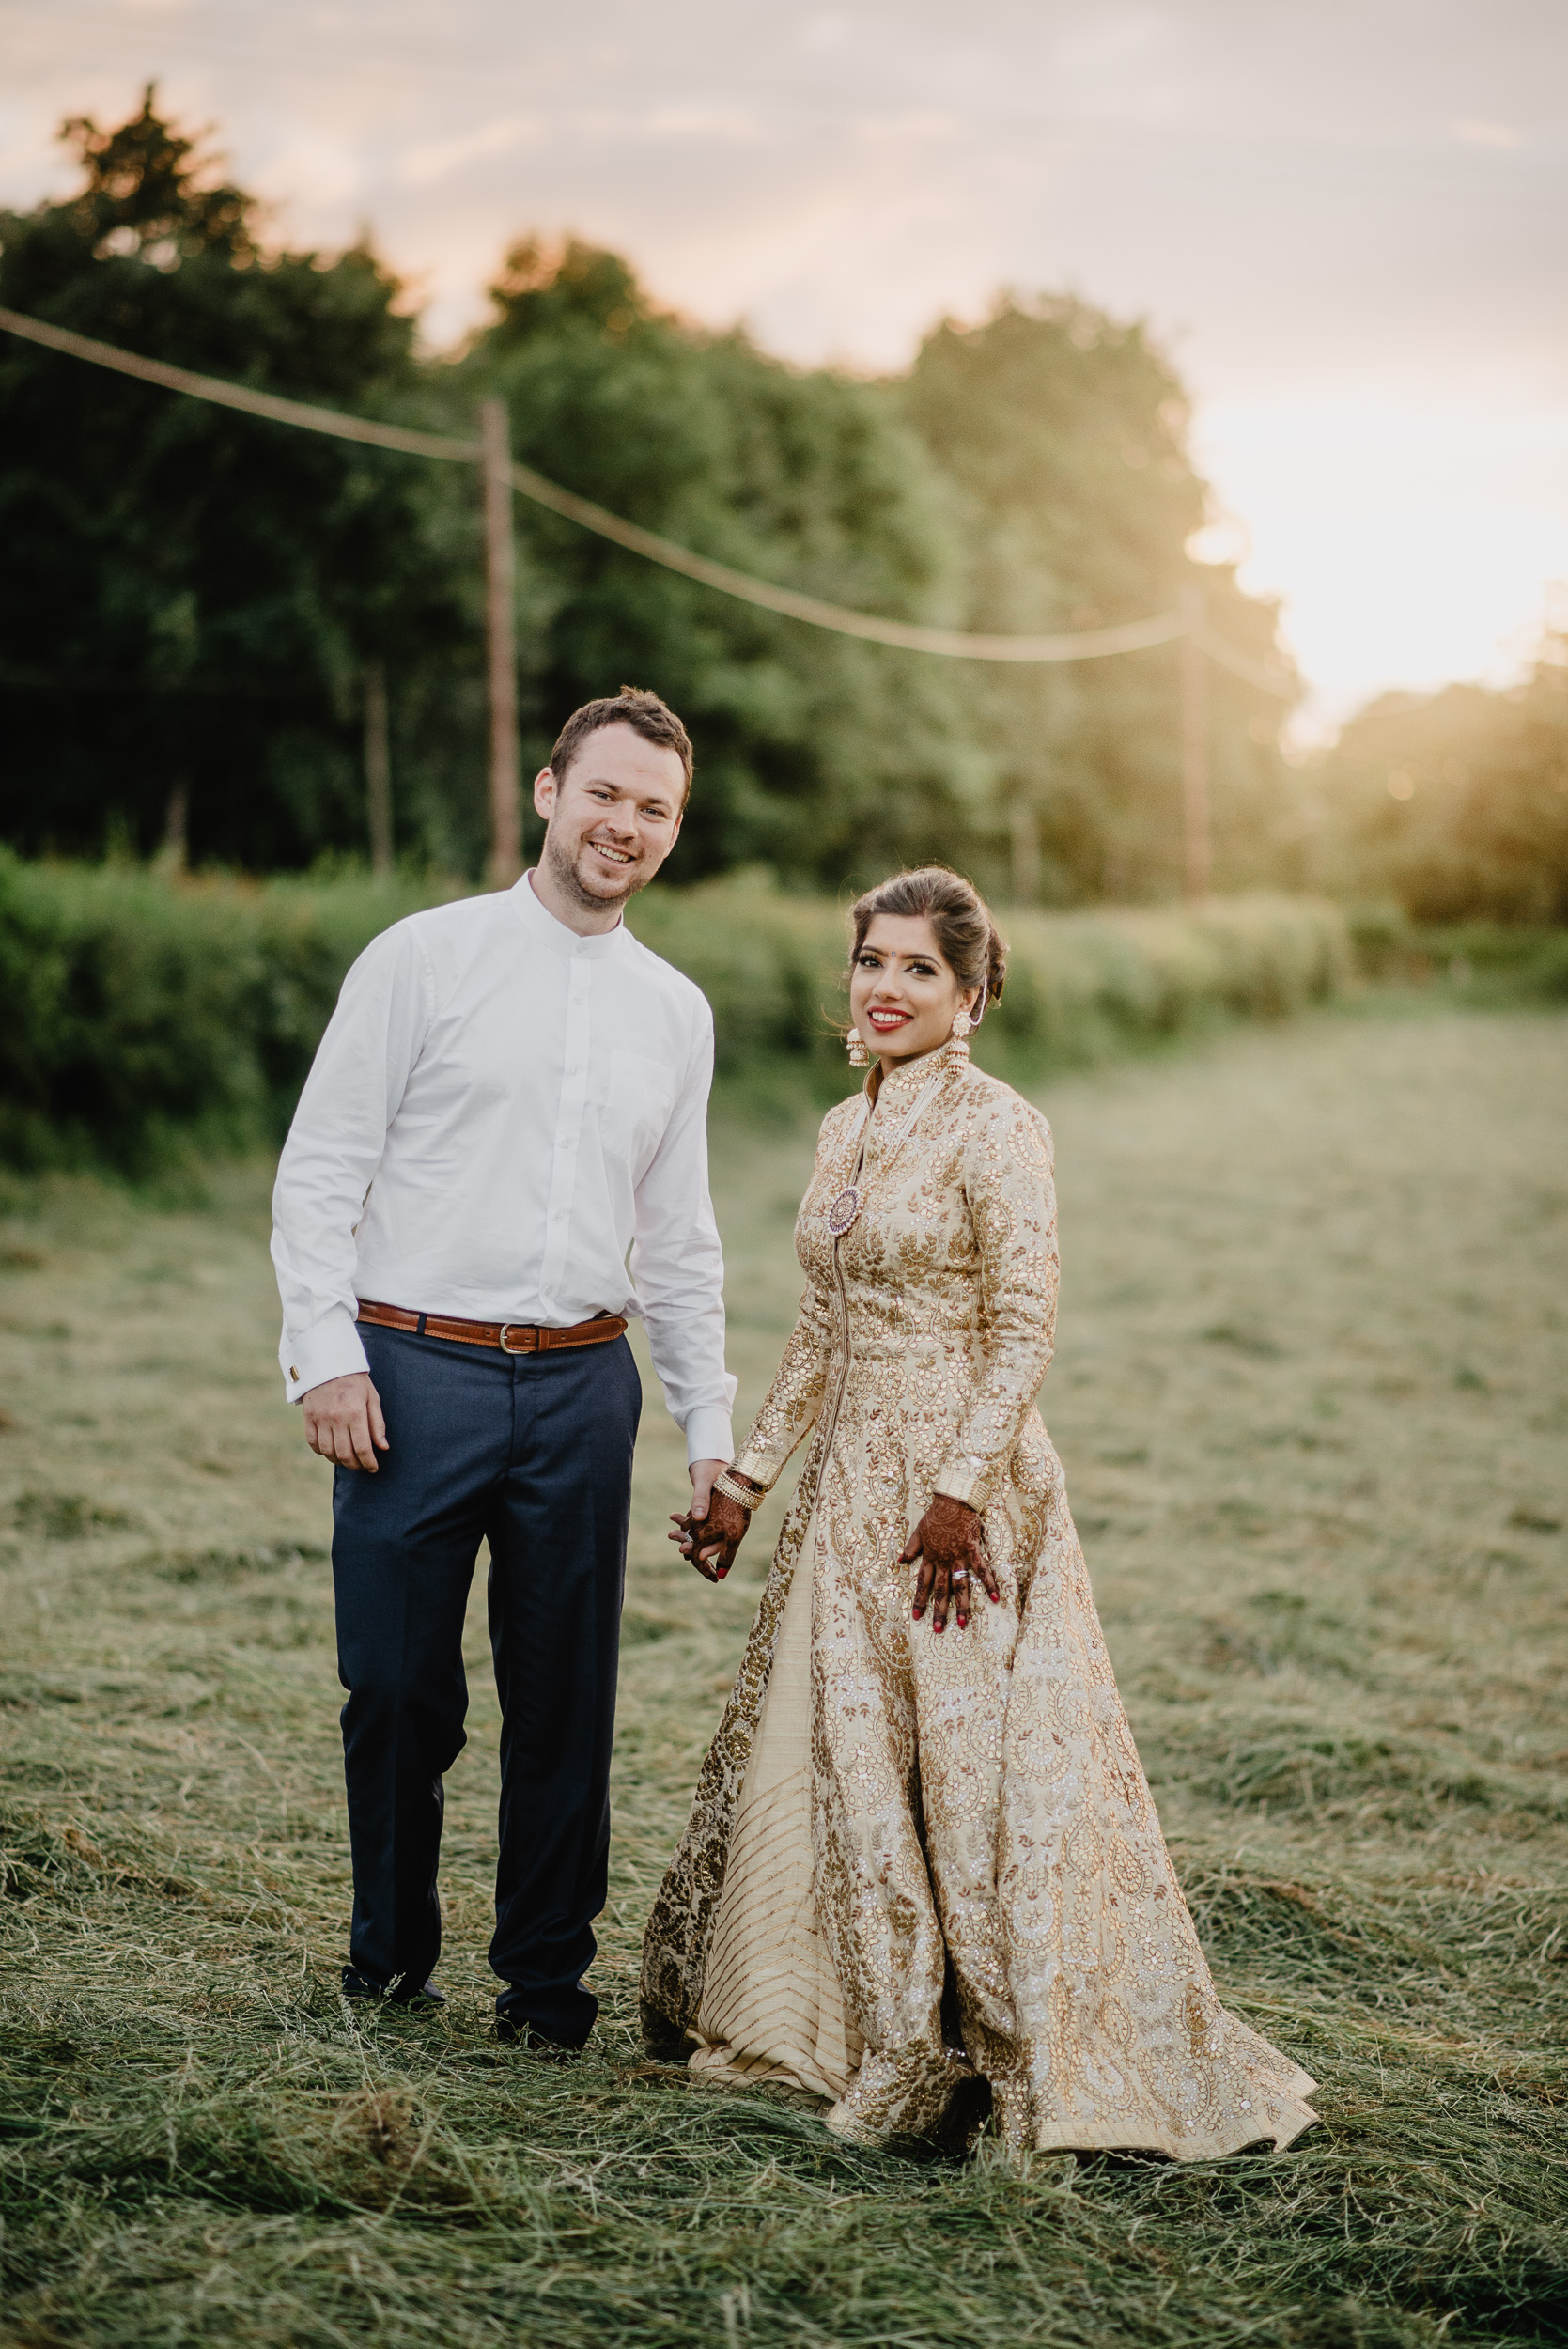 wedding photogaphy peter mackey 2018-11.jpg